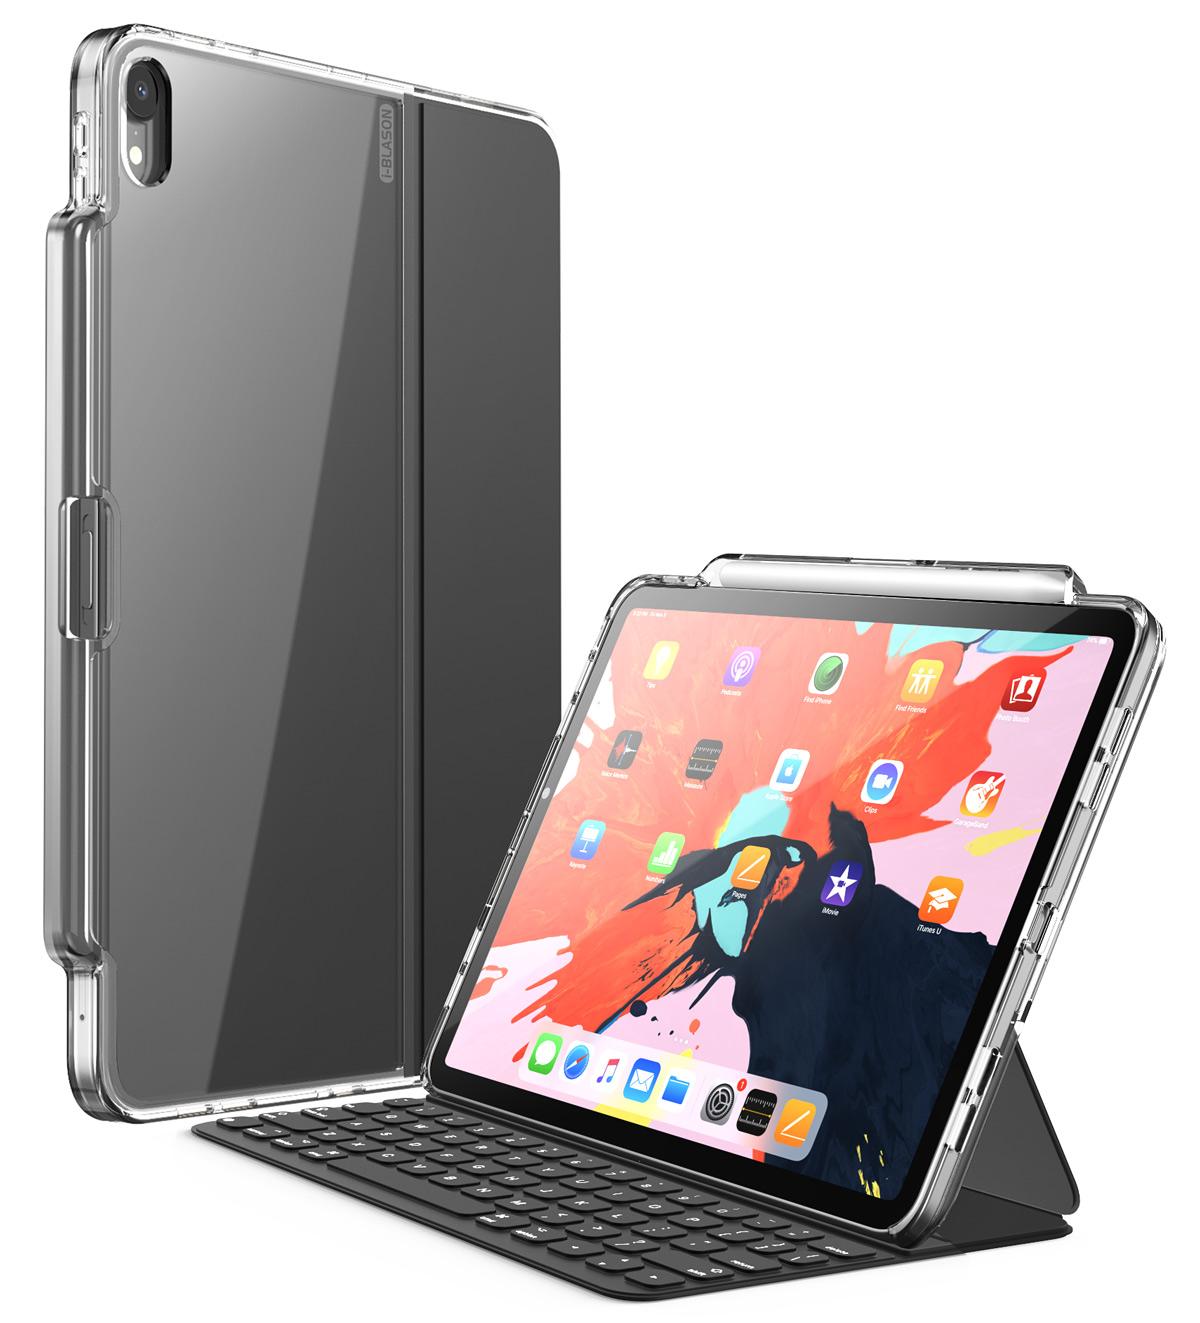 i-Blason iPadPro 11.0 12.9 インチ ケース 2018 第1世代 iPad Pro 第3世代 公式 folioとSmart クリア 薄型 お見舞い Pencil収納 keyword 軽量 Smart 併用 実物 folio 保護ケース Apple 黒